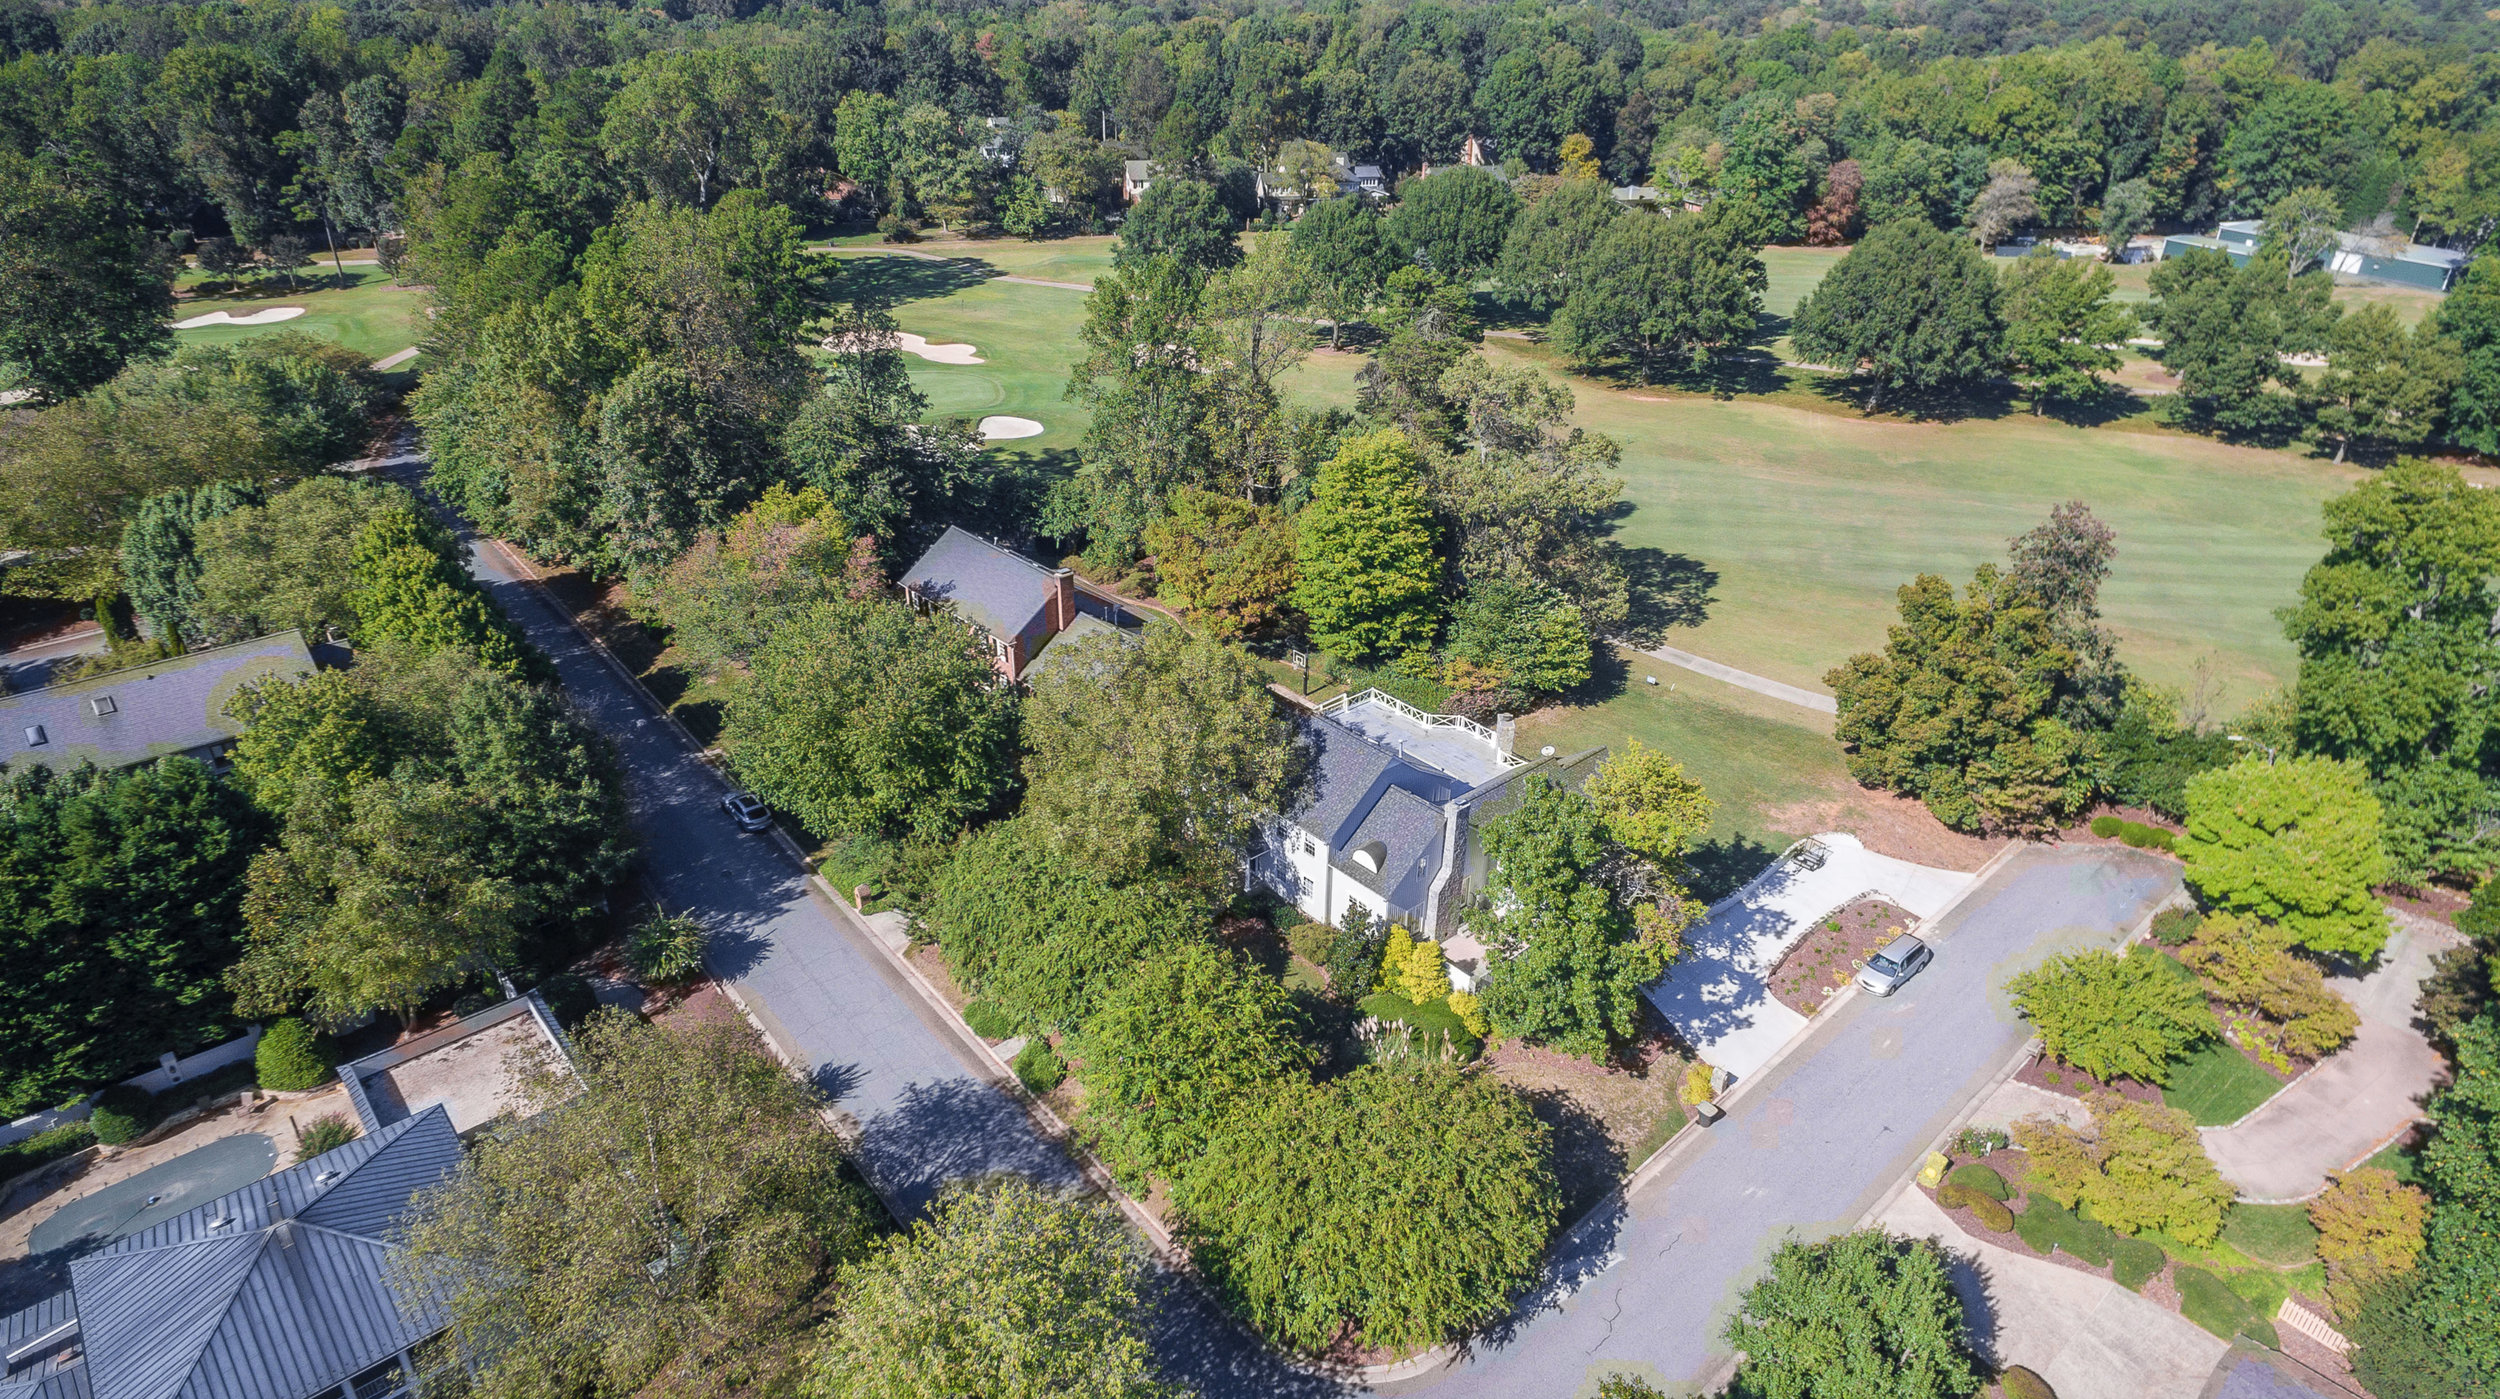 greensboro-real-estate-photography-high-point-kernersville-north-carolina-photographer-burlington-realtor.jpg